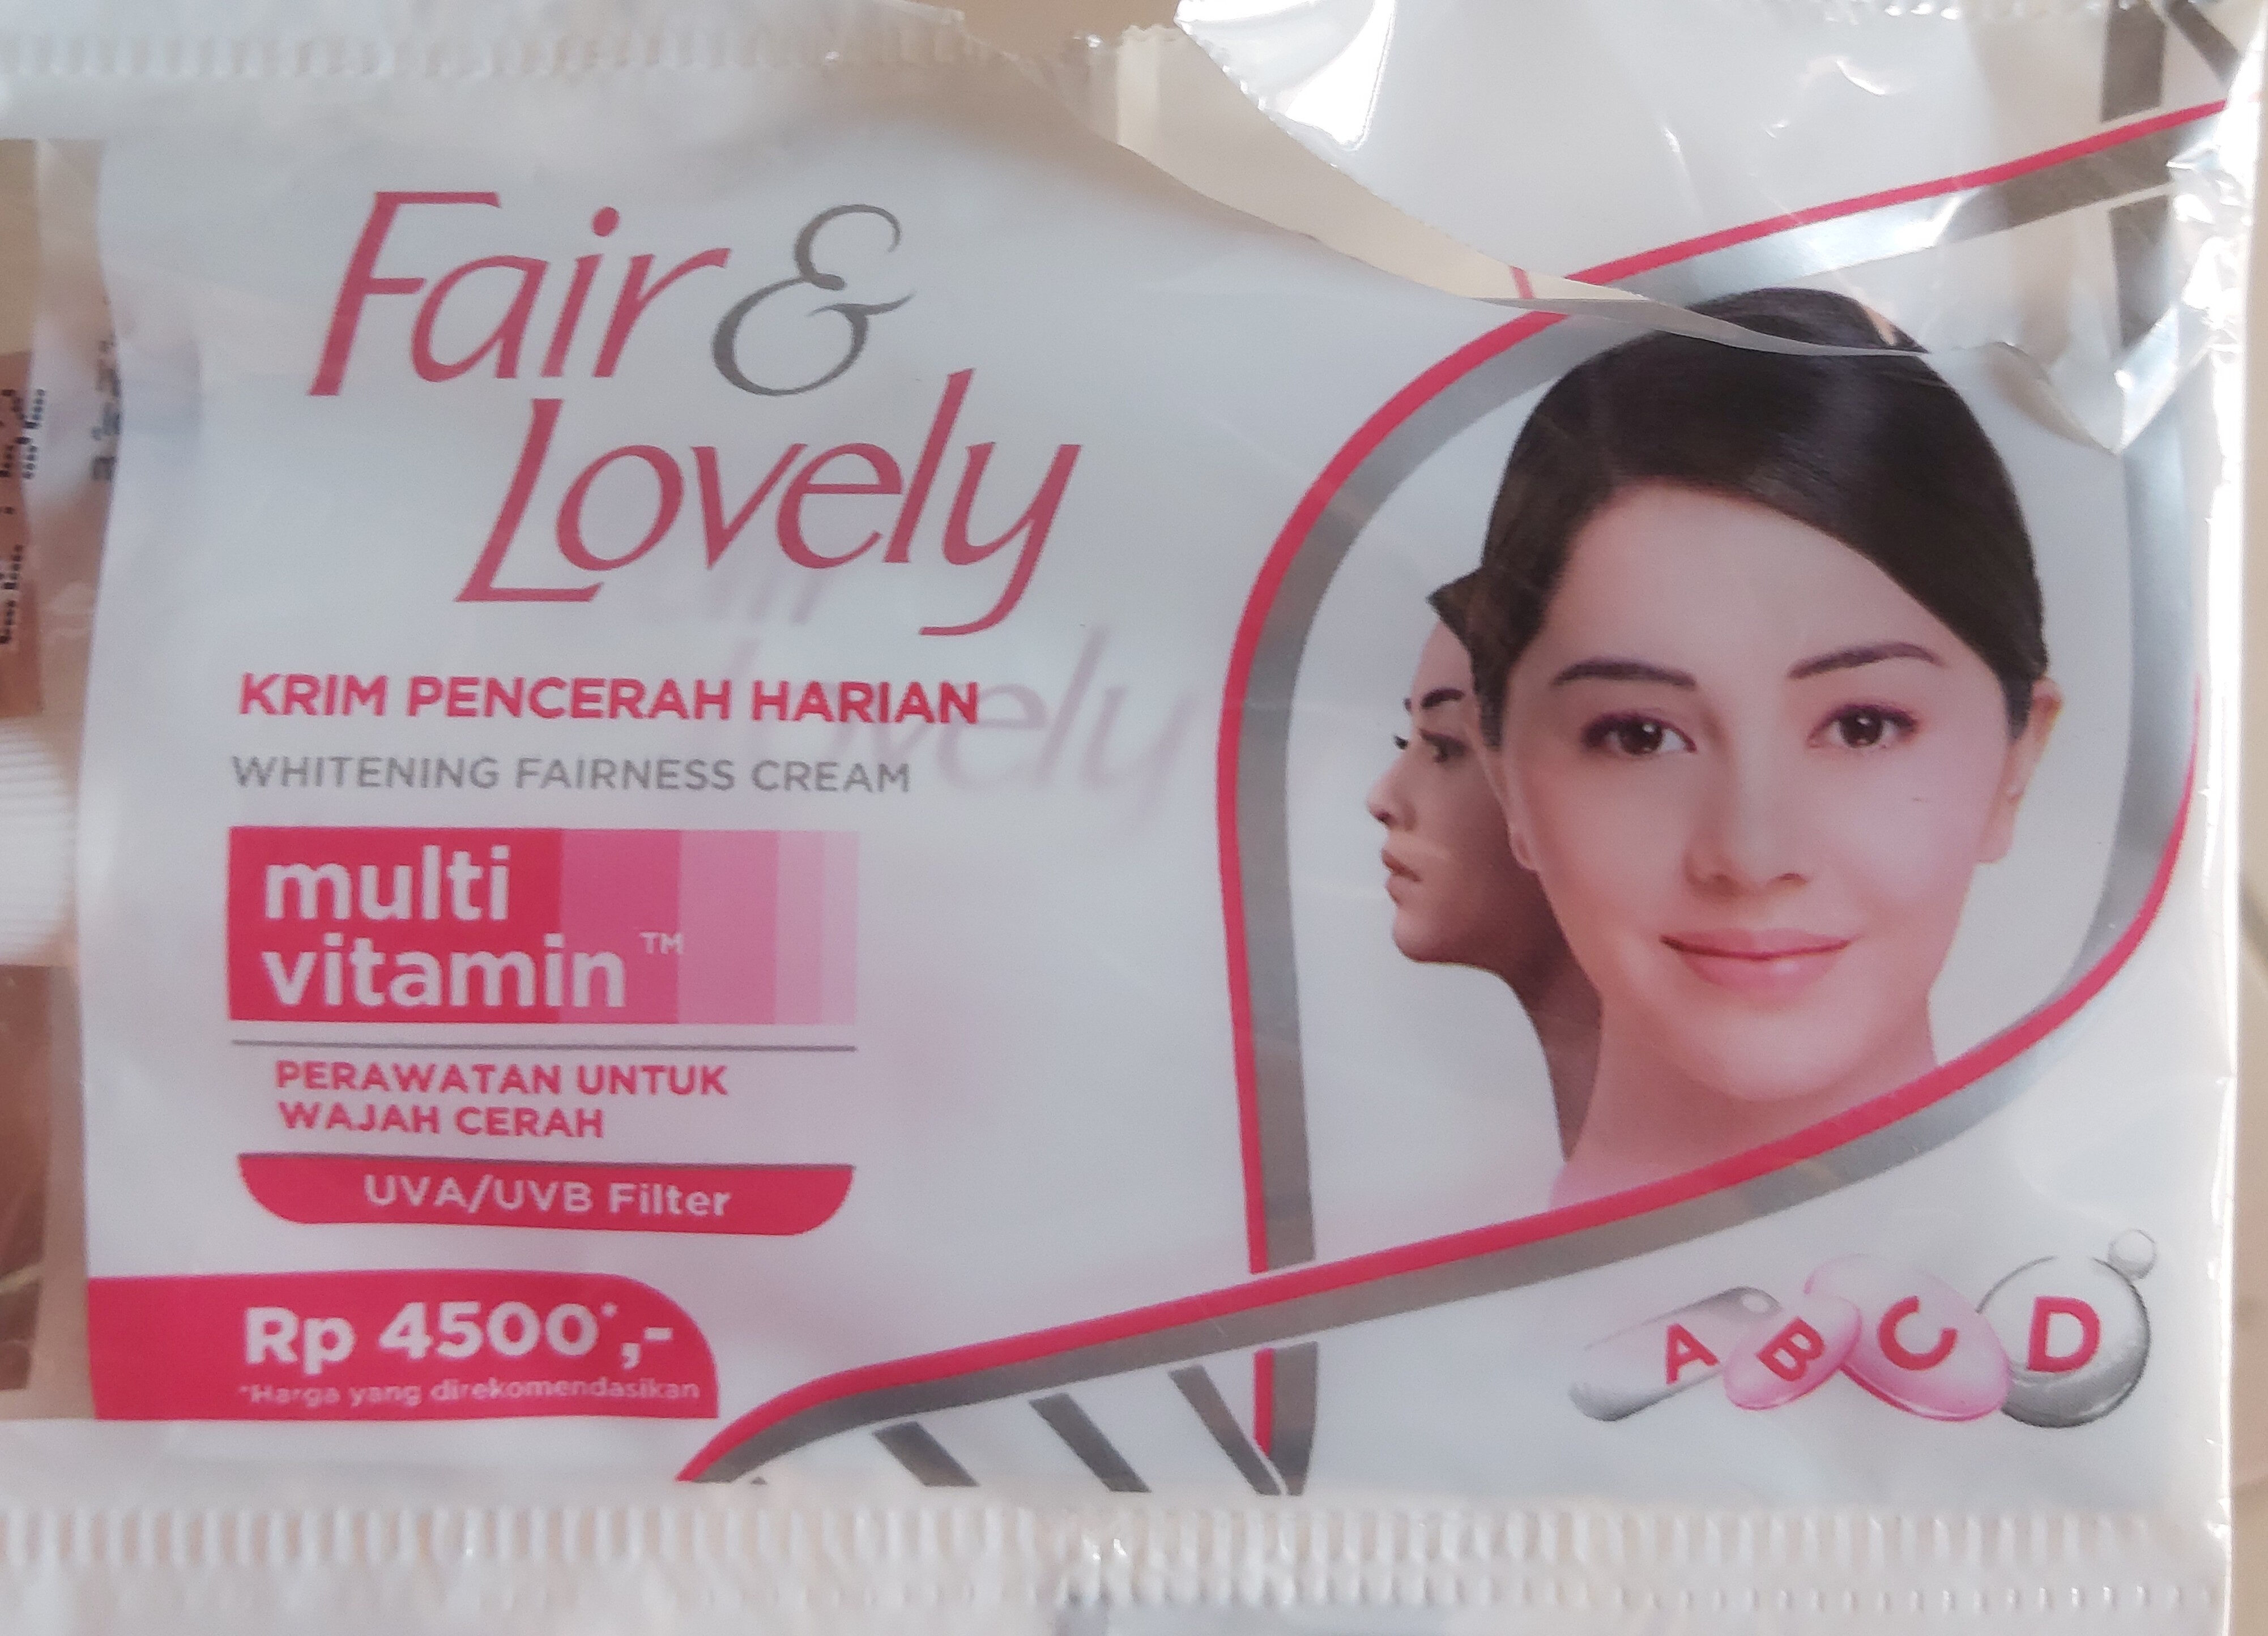 Fair & Lovely - Product - km